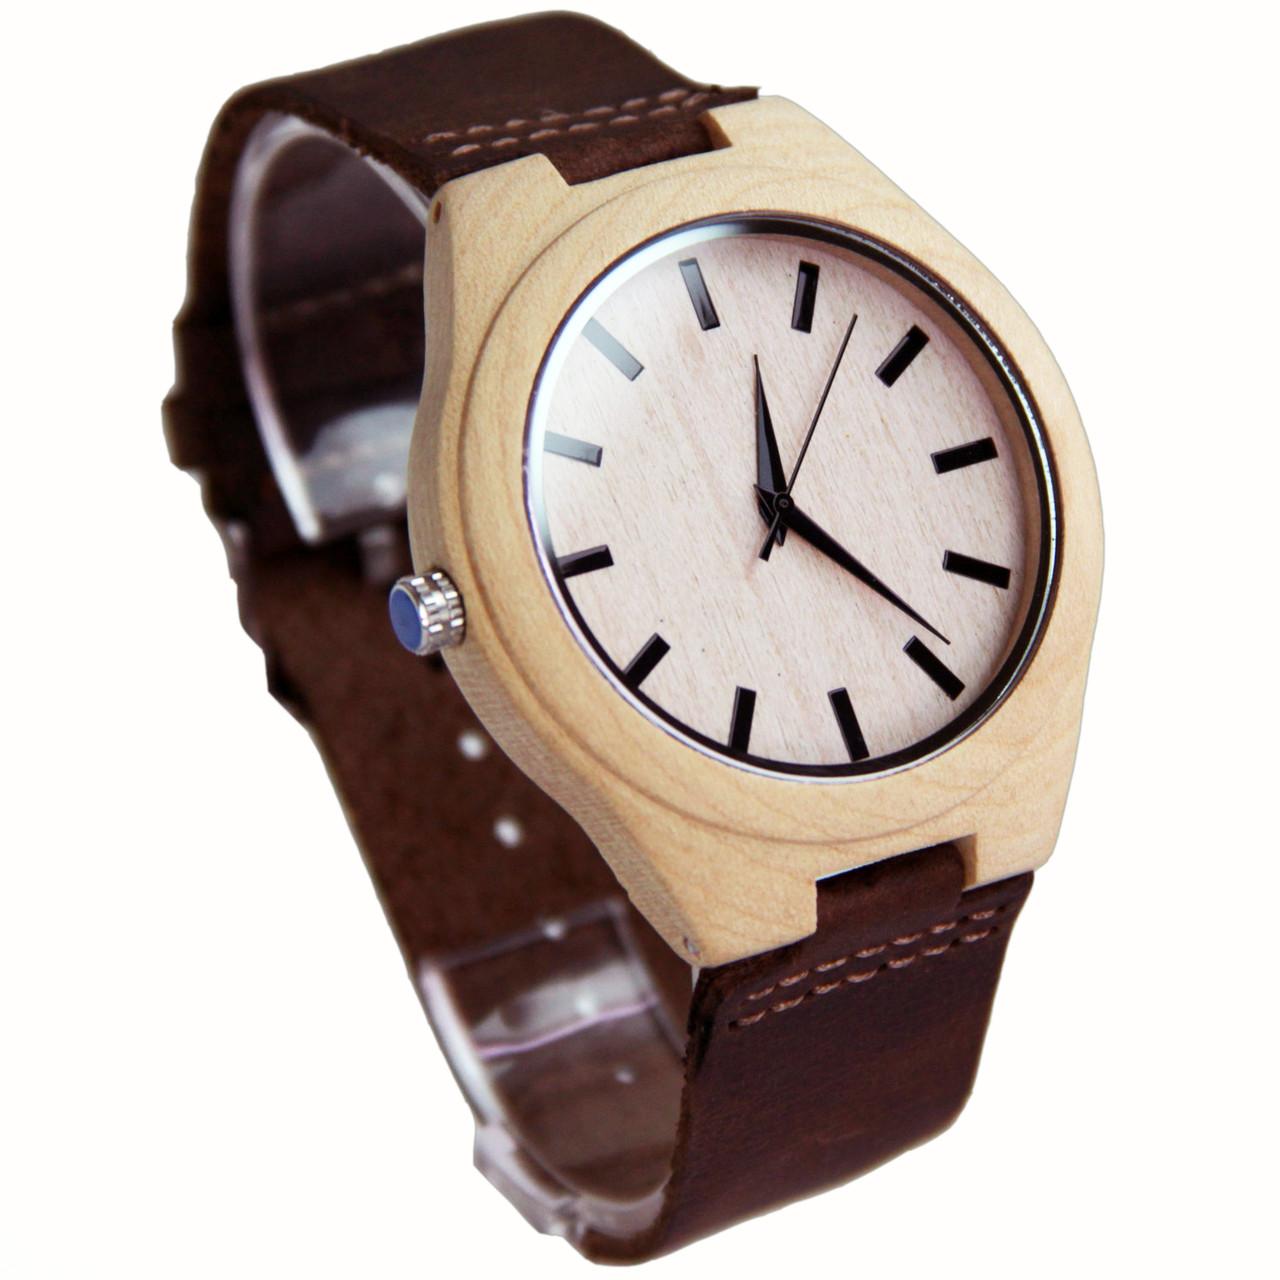 LUX - Personalized Watch W#82 - Dash